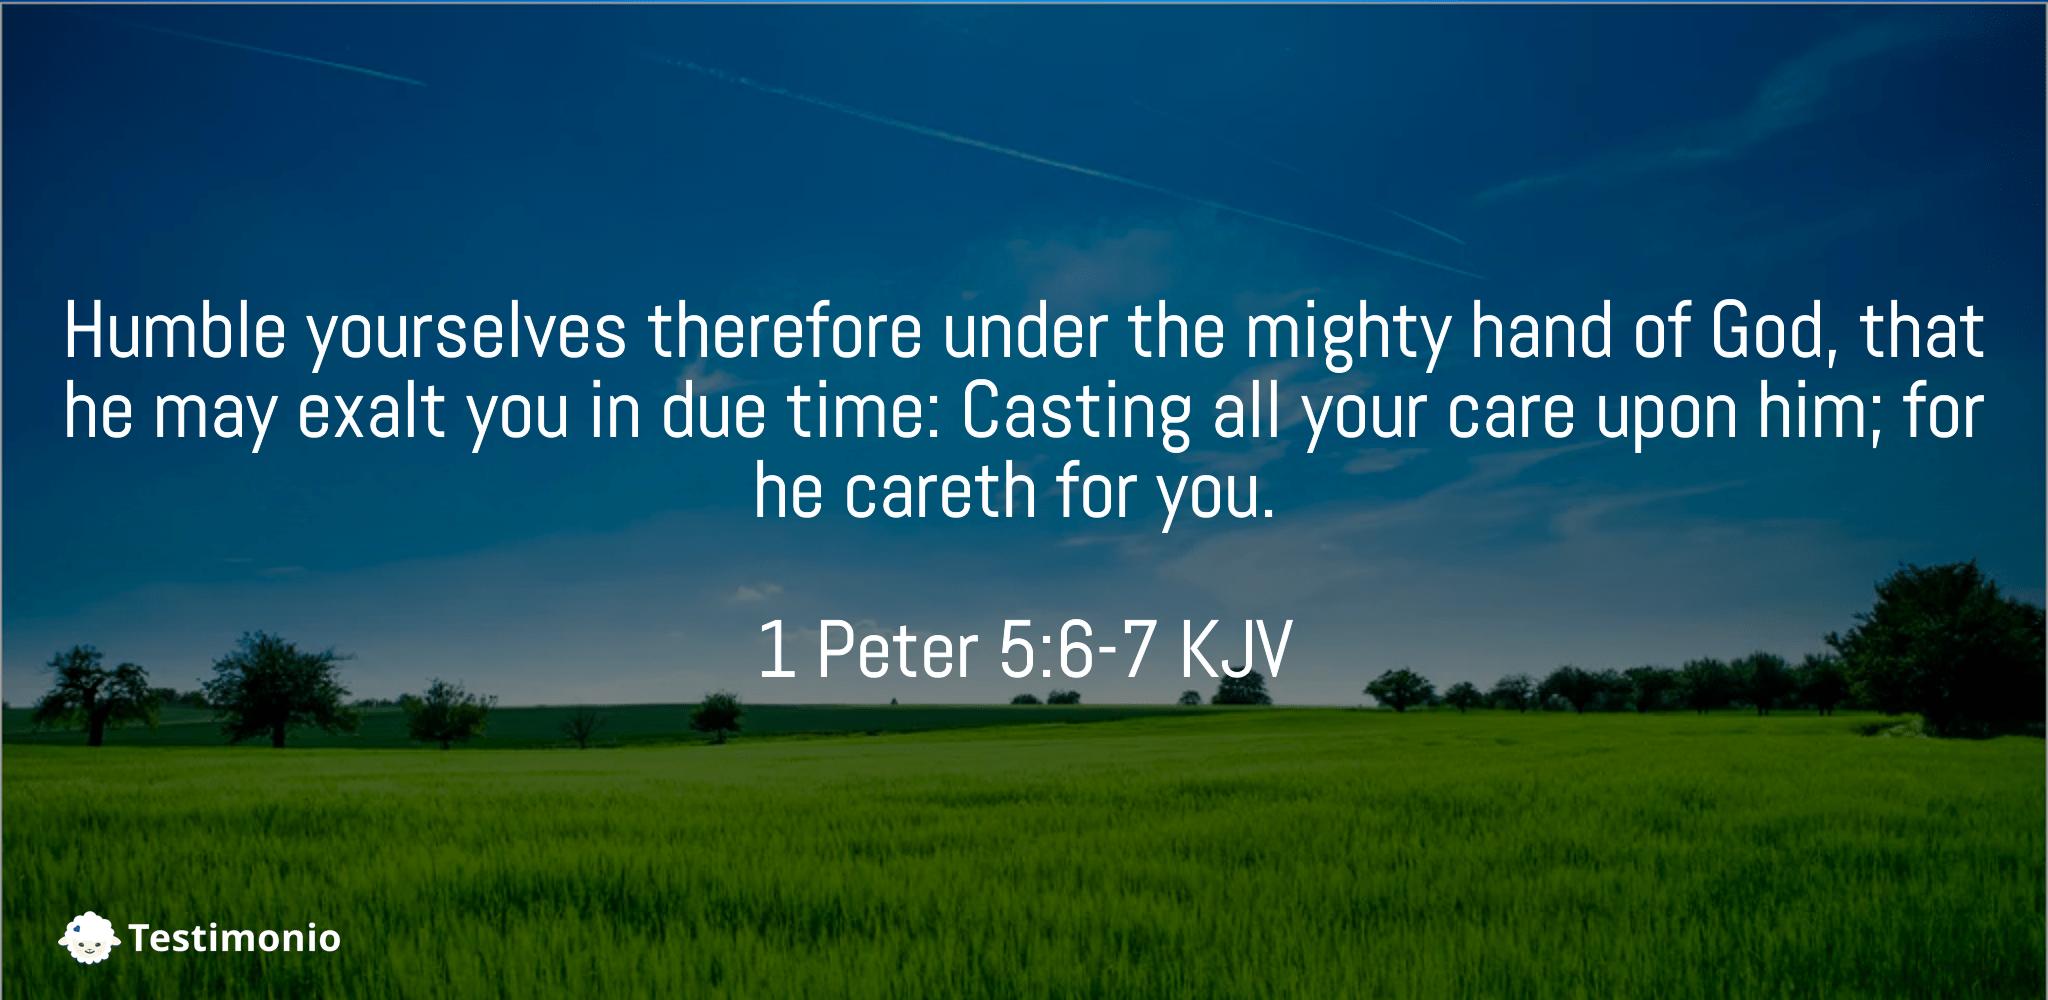 1 Peter 5:6-7